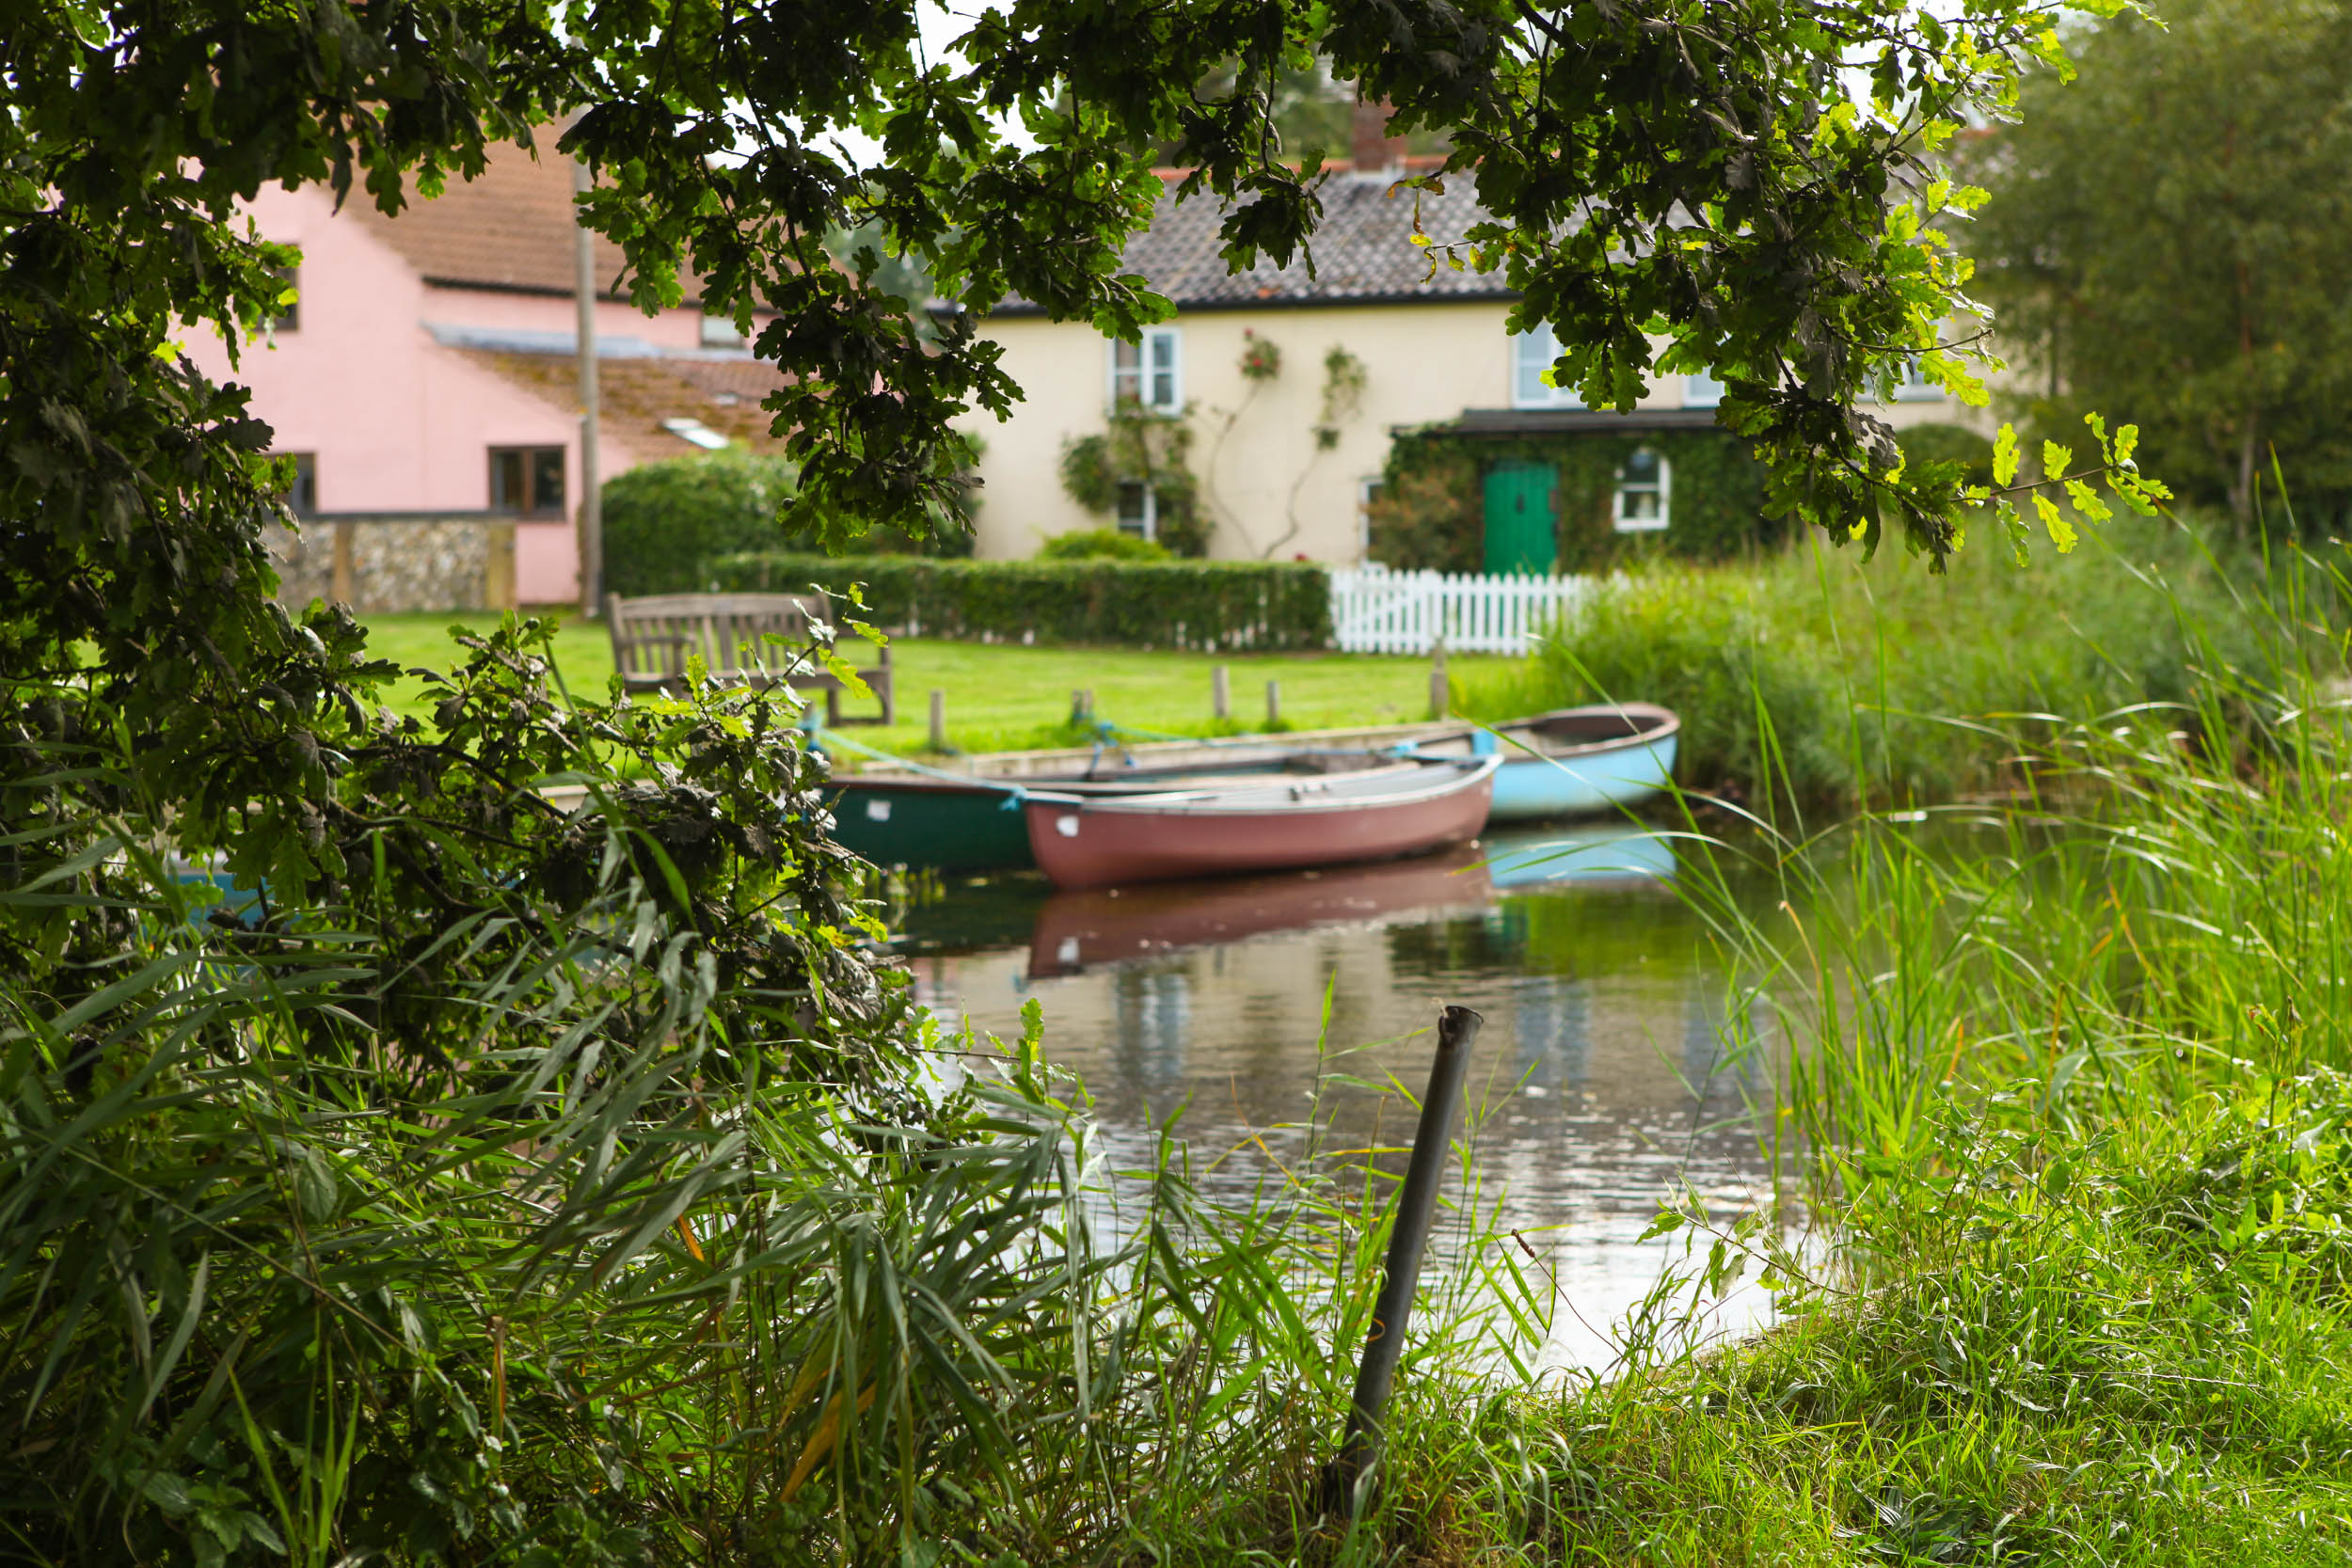 belle-aire-hemsby-holiday-park-norfolk-broads.jpg